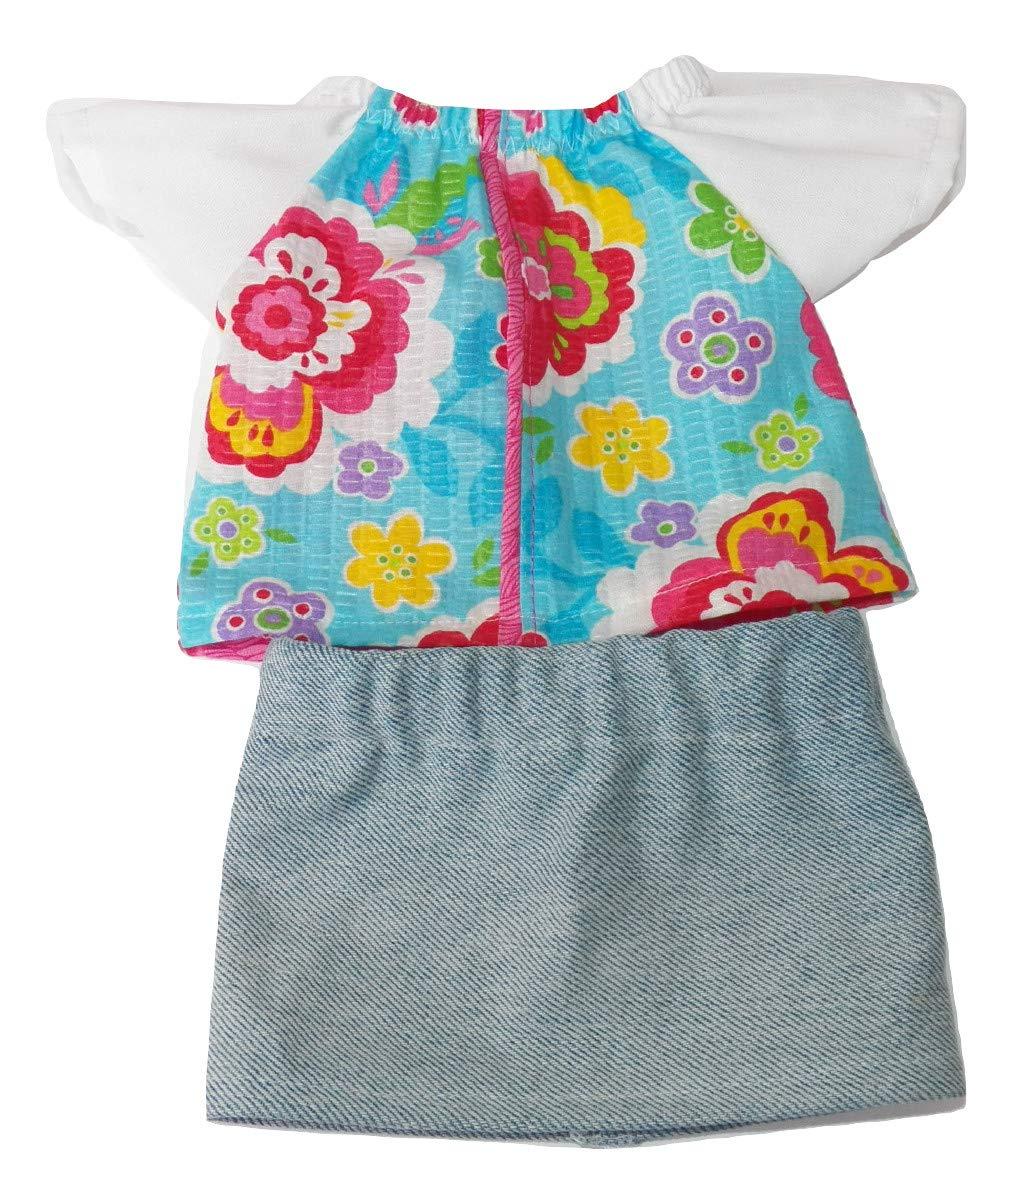 Cabbage Patch Kids 16 inch Doll Clothes Handmade Blue Jean Denim Skirt Set